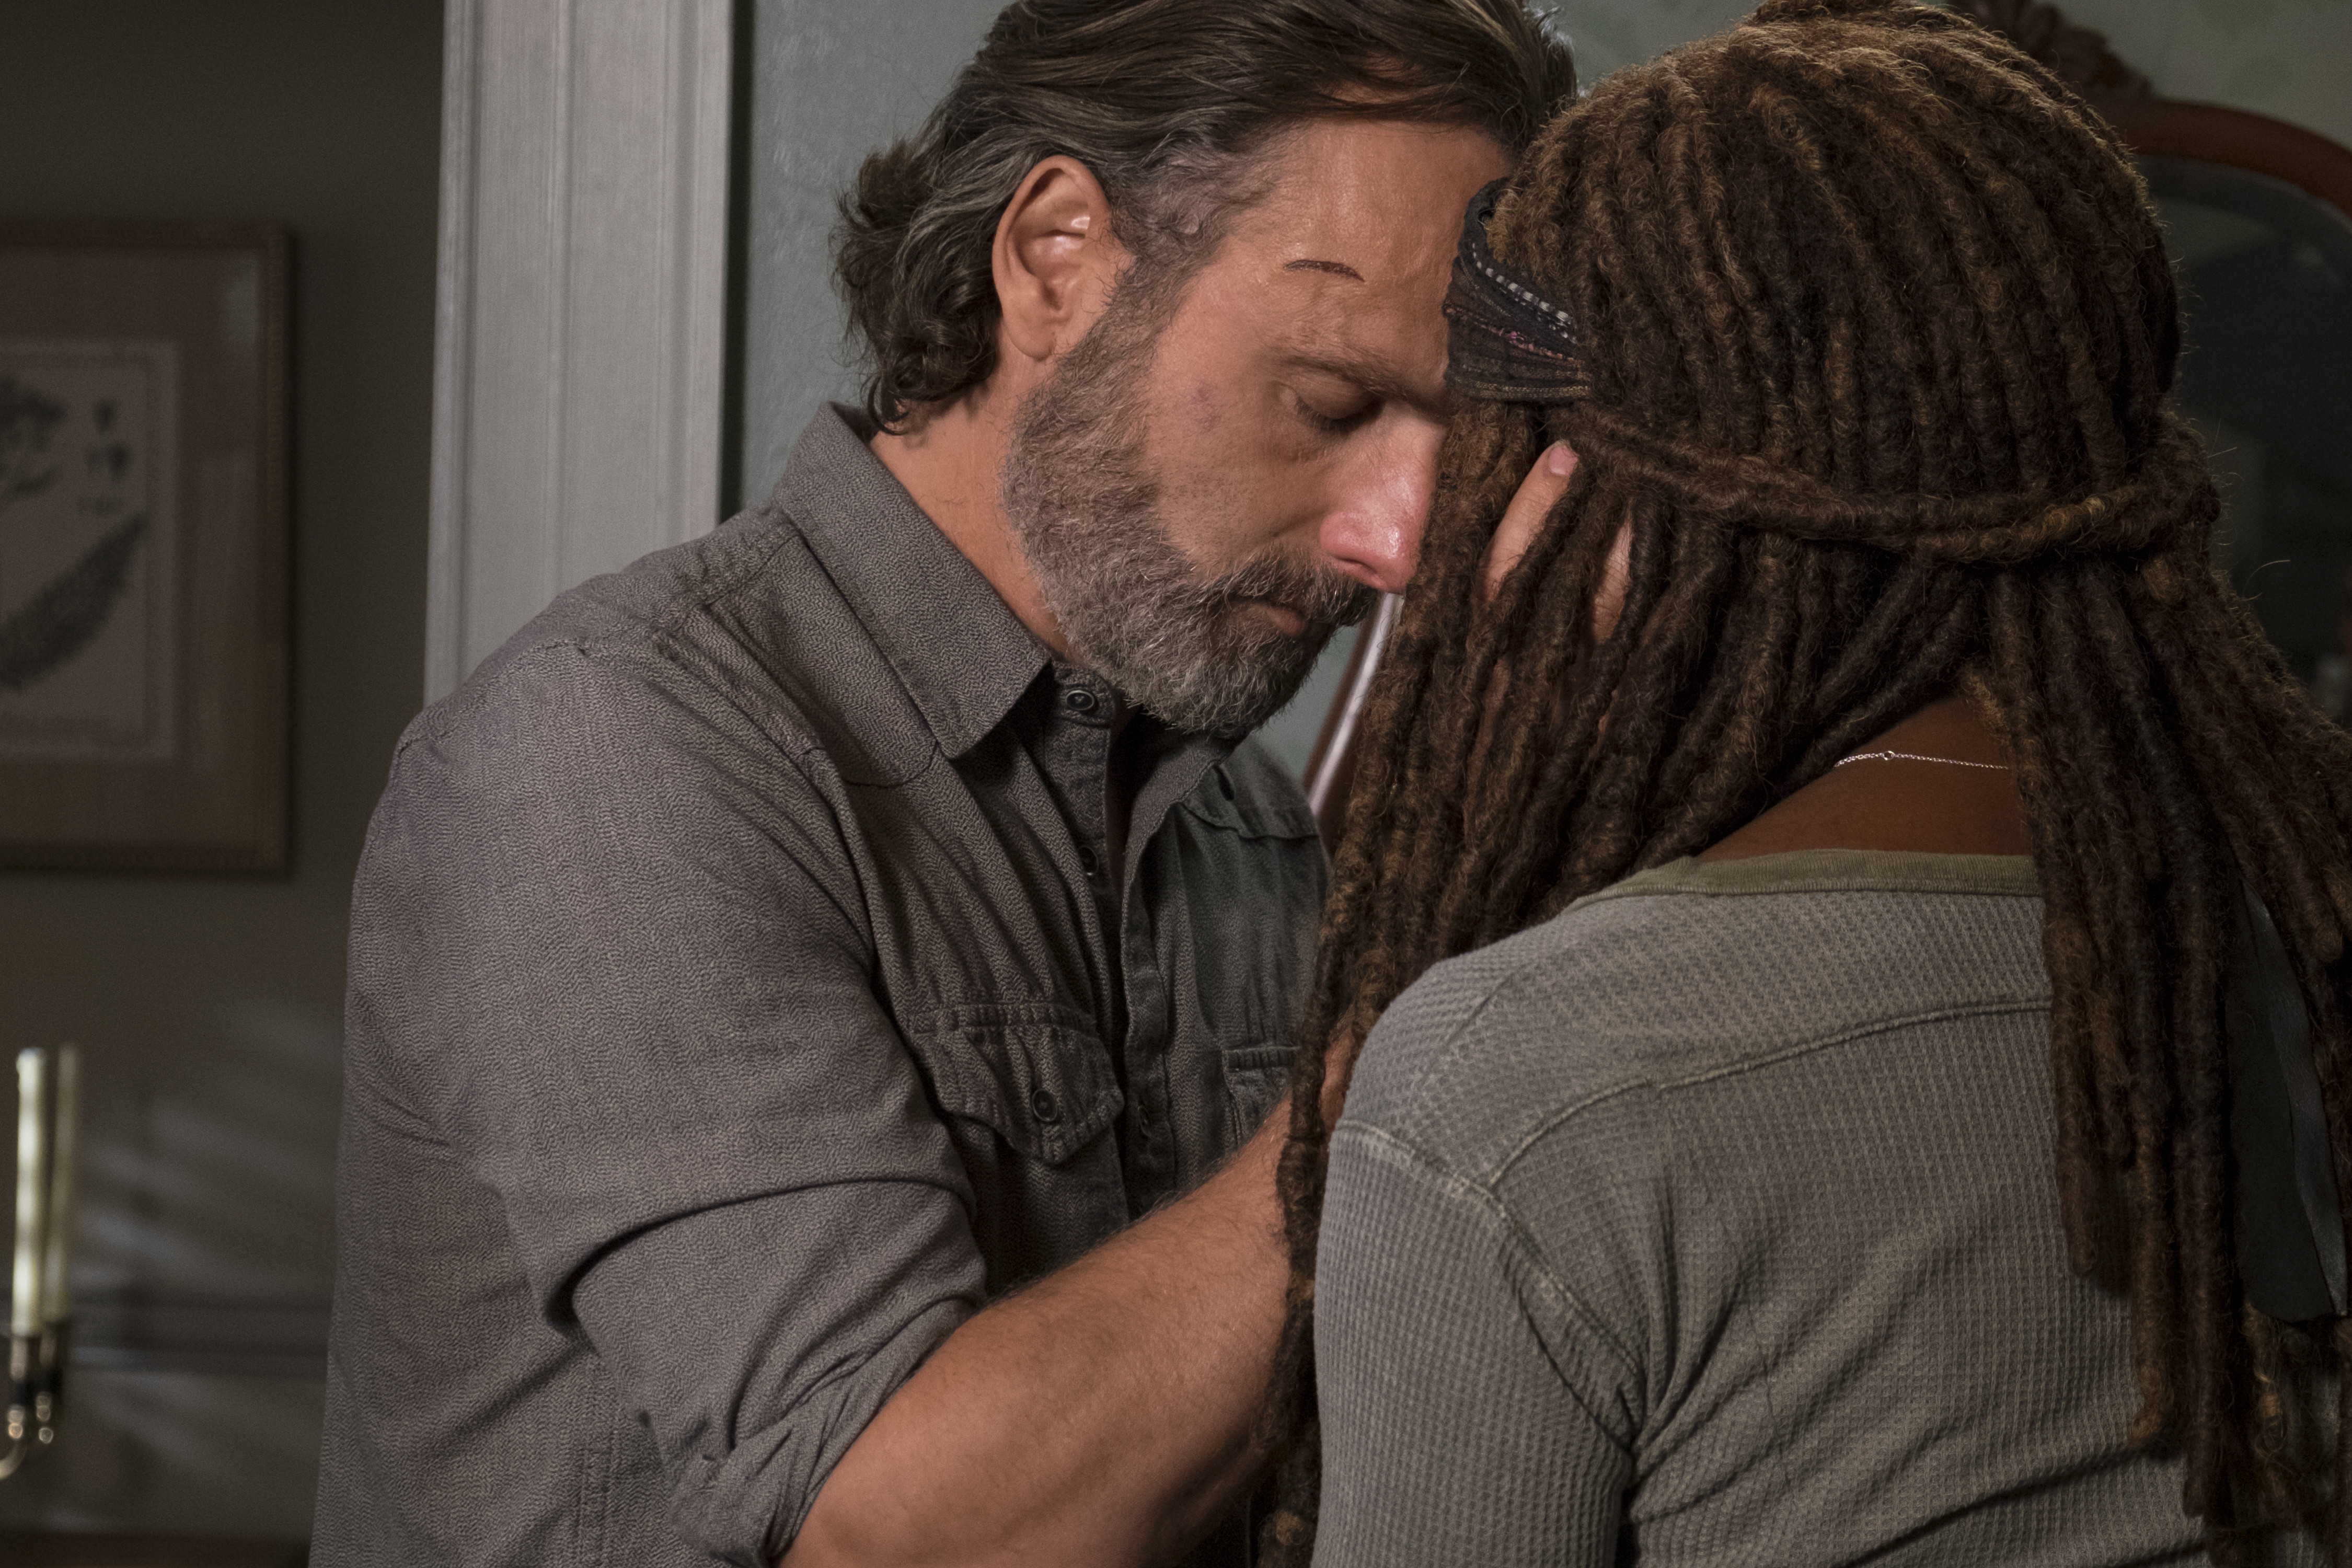 The Walking Dead Season 9 Get A Glimpse Of Old Man Rick In New Set